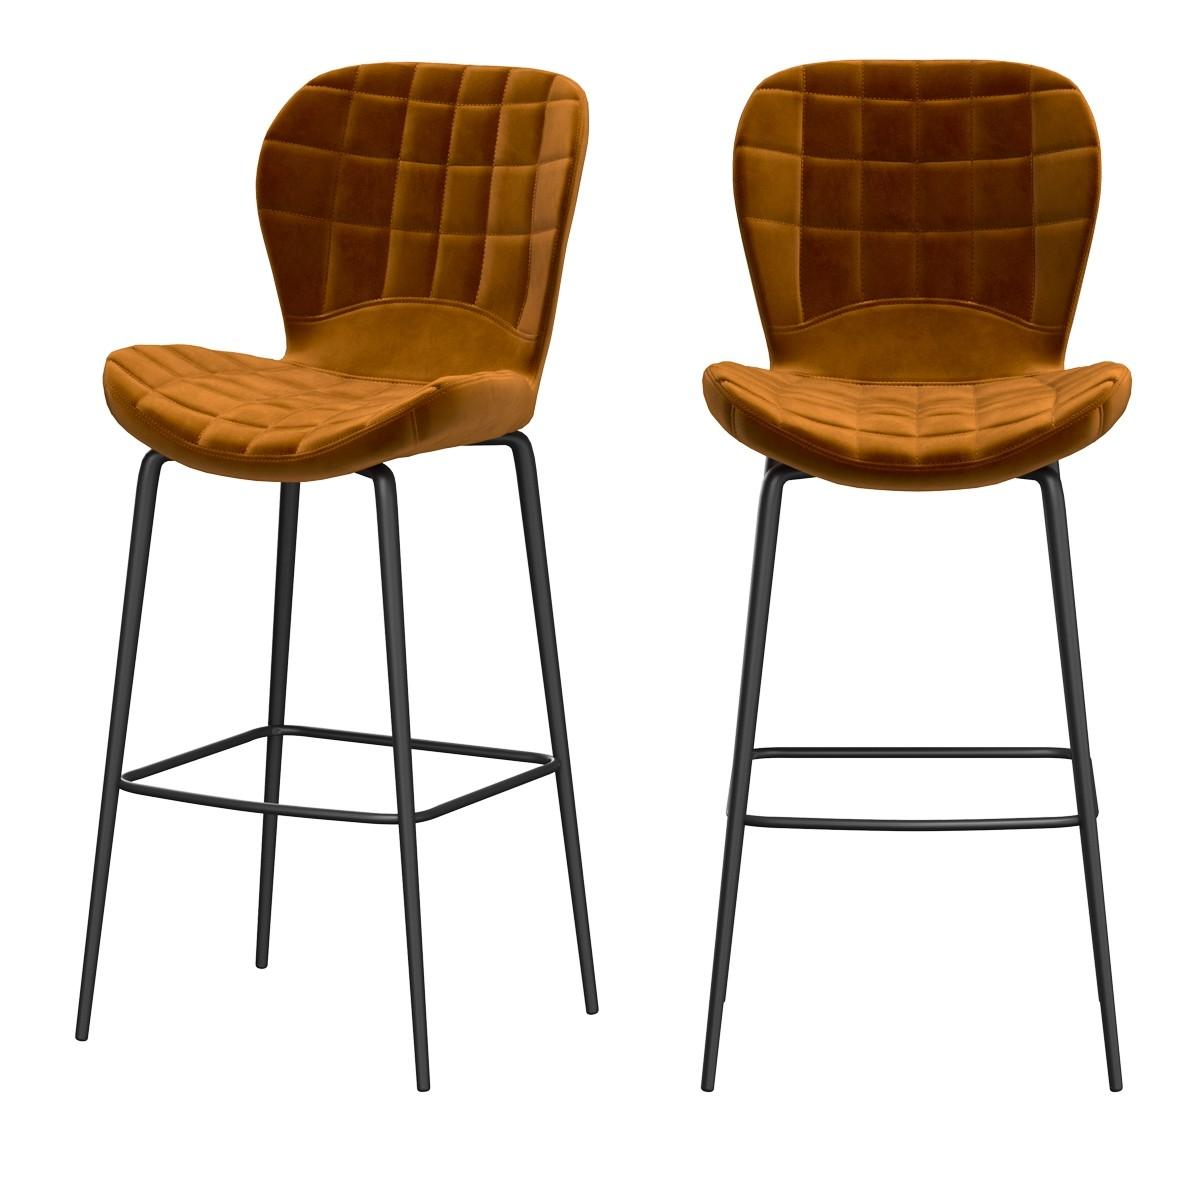 achat chaise de bar molletonnee velours